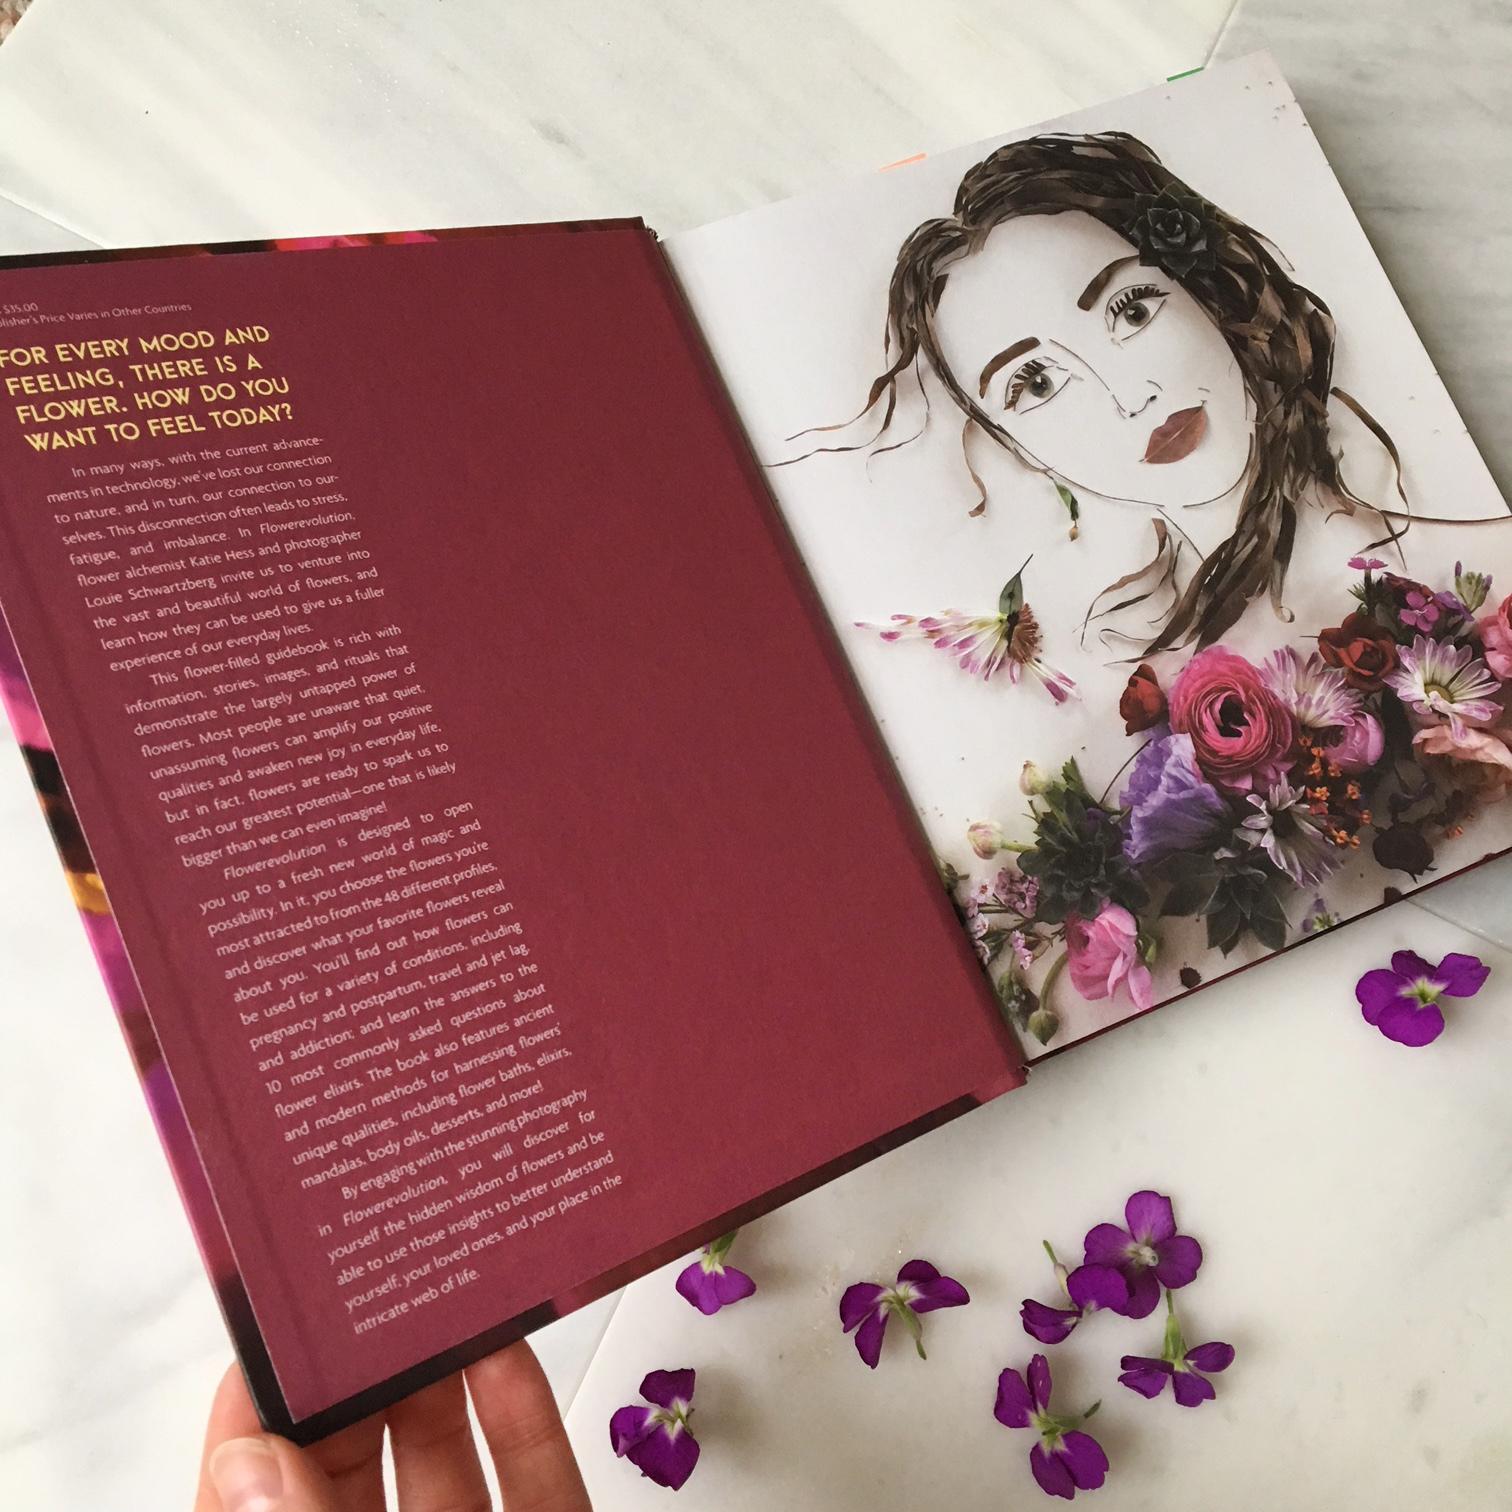 Flowerevolution book by Katie Hess Lotus Wei 2